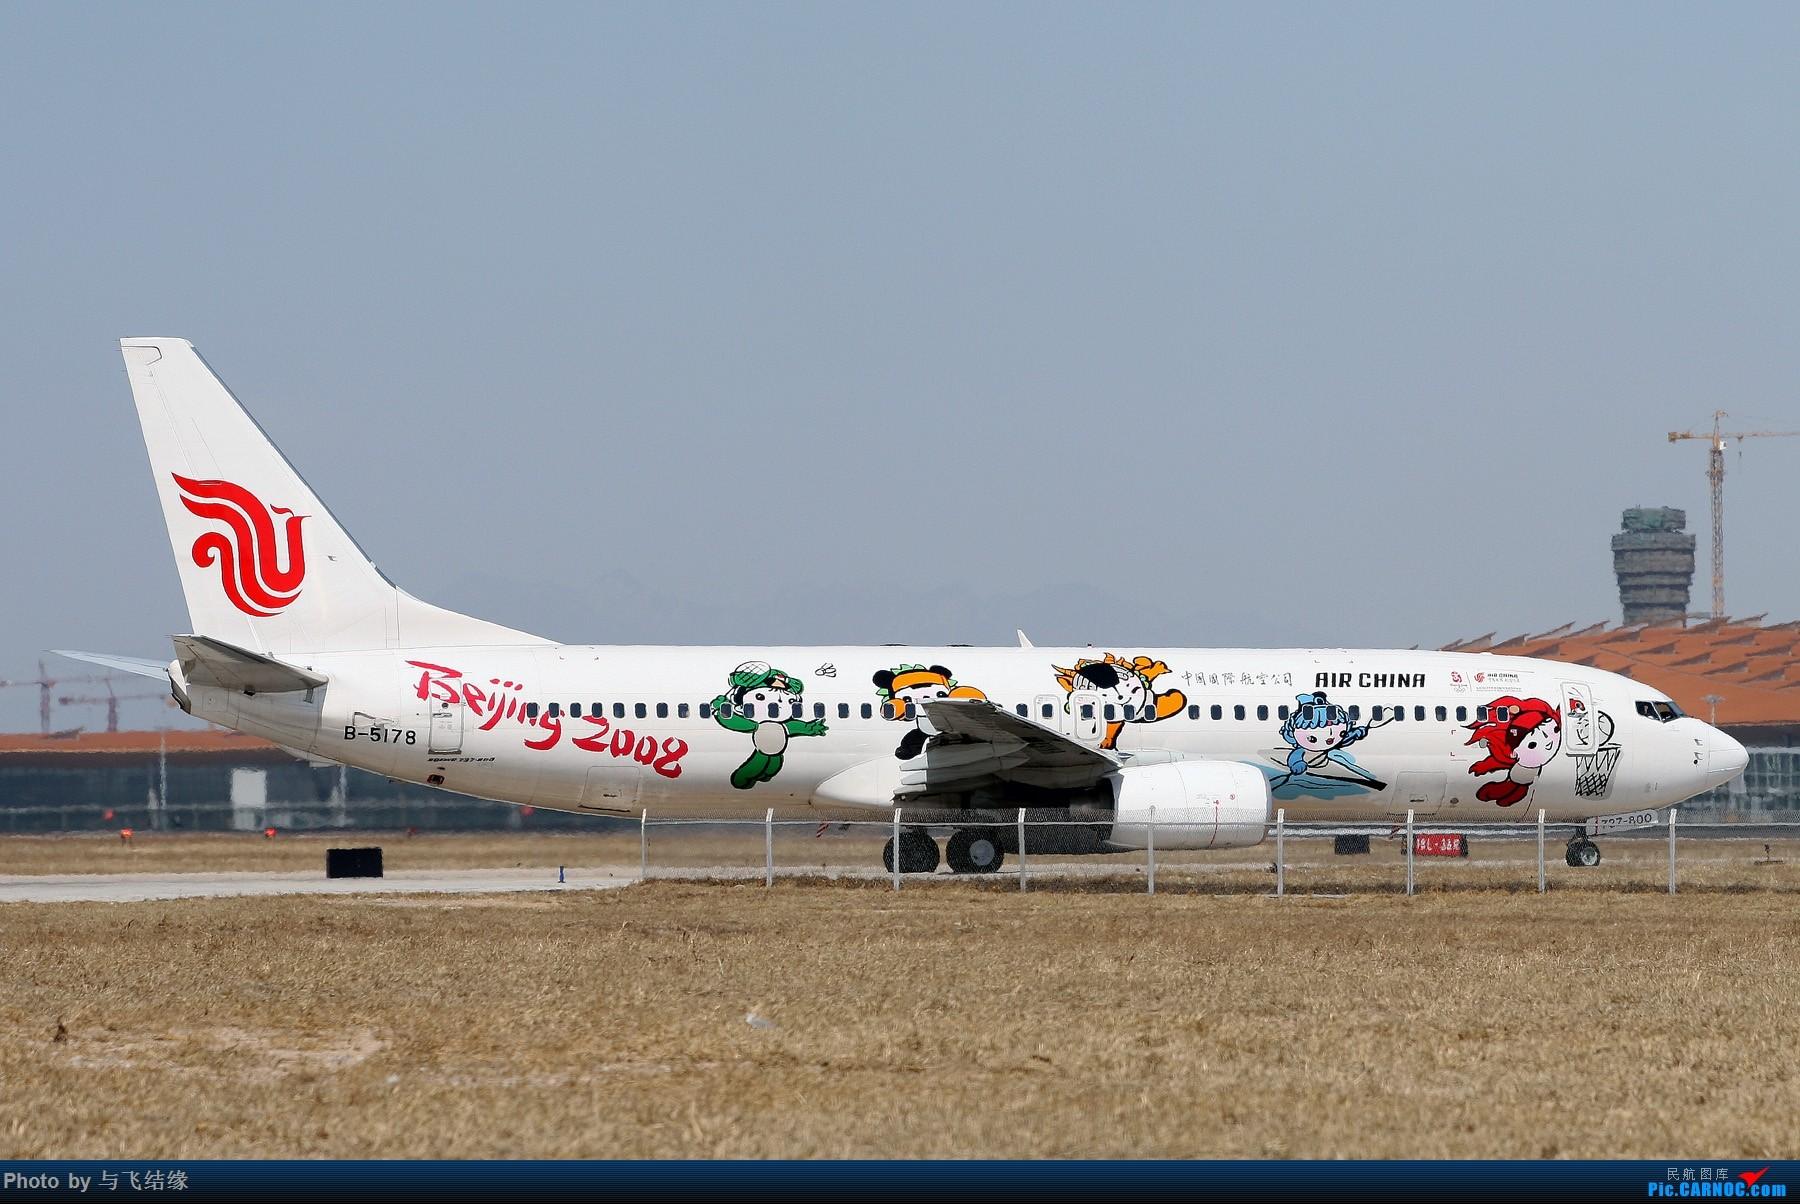 Re:[公告]传承奥运精神 寻找那些年曾经拍过的国航奥运彩绘机~ 贴图有大奖哦!!! BOEING 737-800 B-5178 中国北京首都国际机场